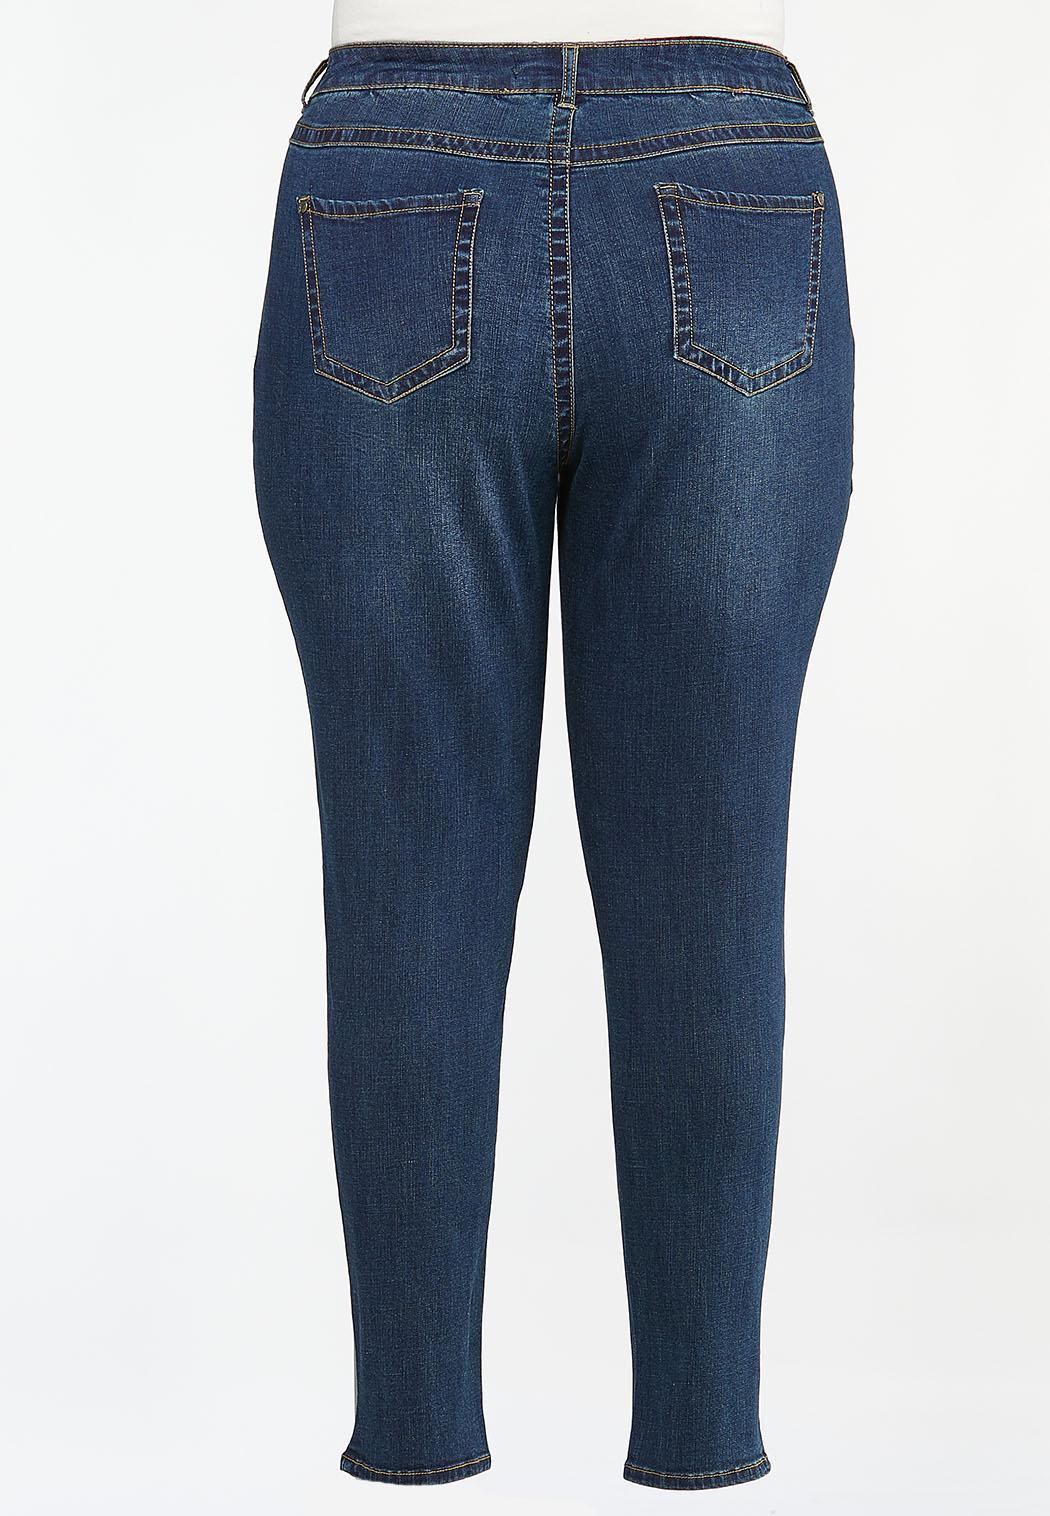 Plus Size Distressed Patchwork Jeans (Item #44378556)